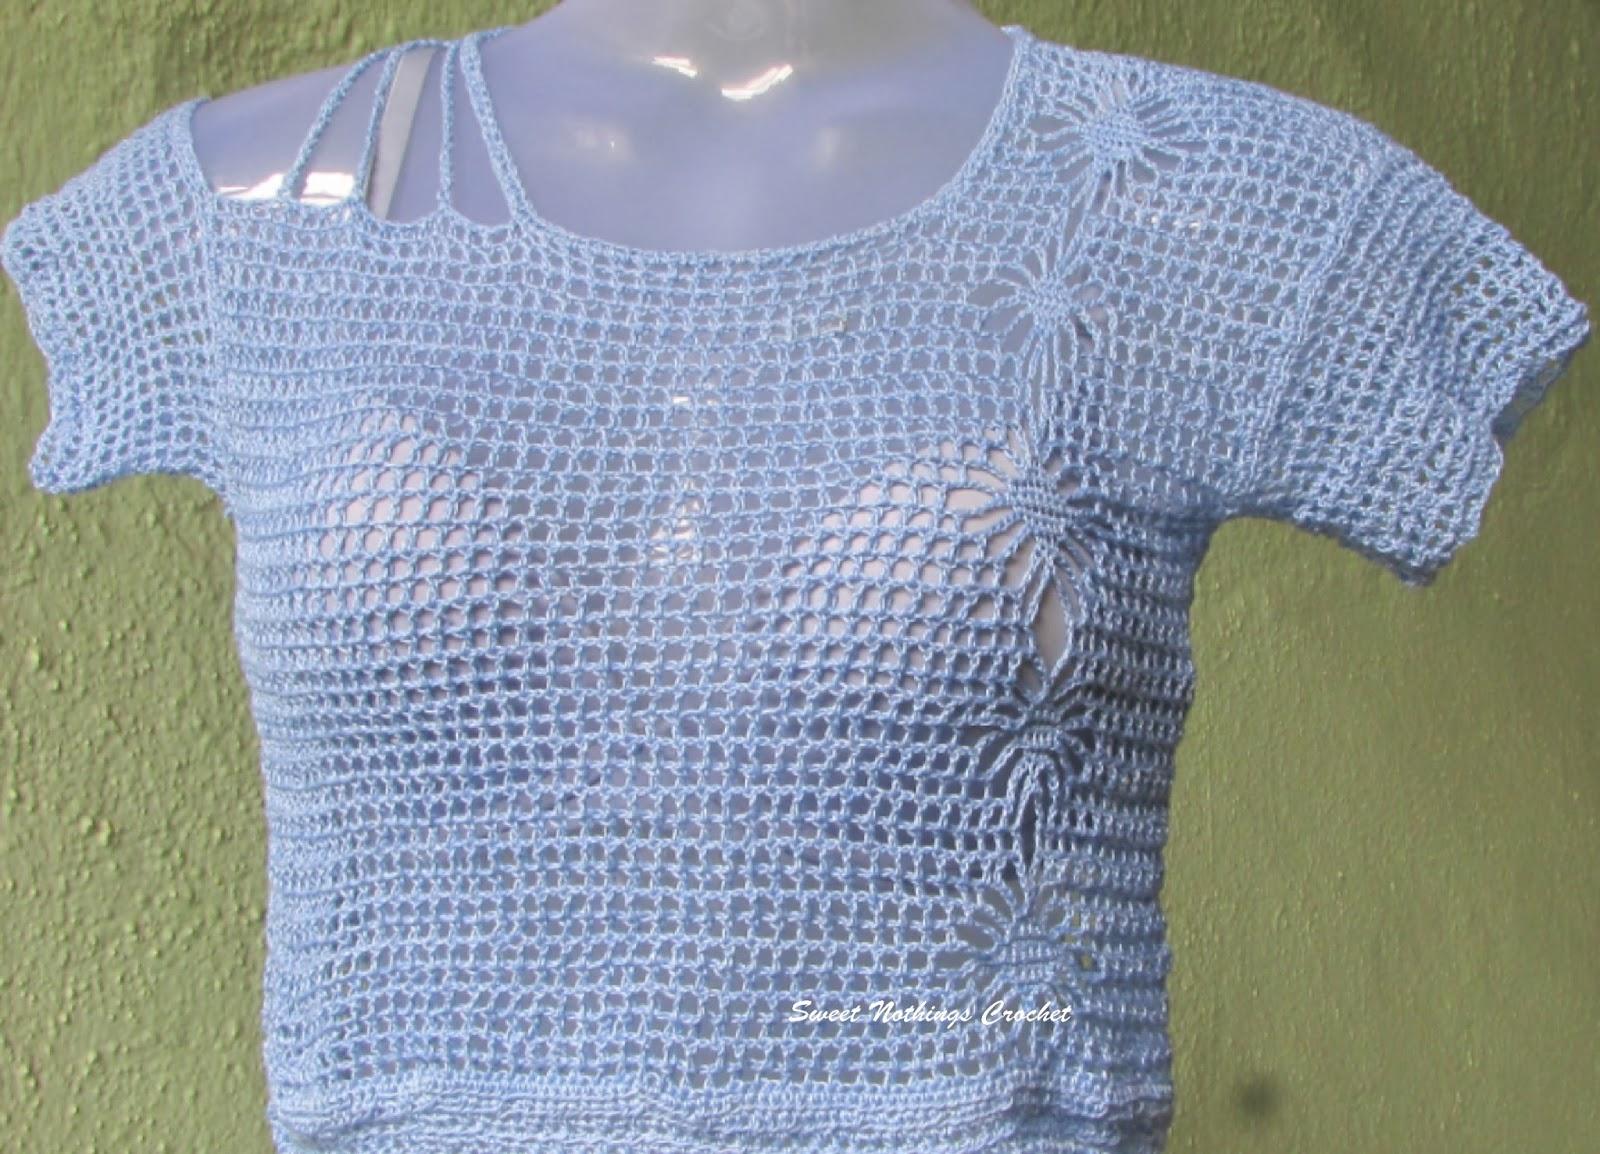 bc6319689788b Sweet Nothings Crochet  LATTICED CROP TOP